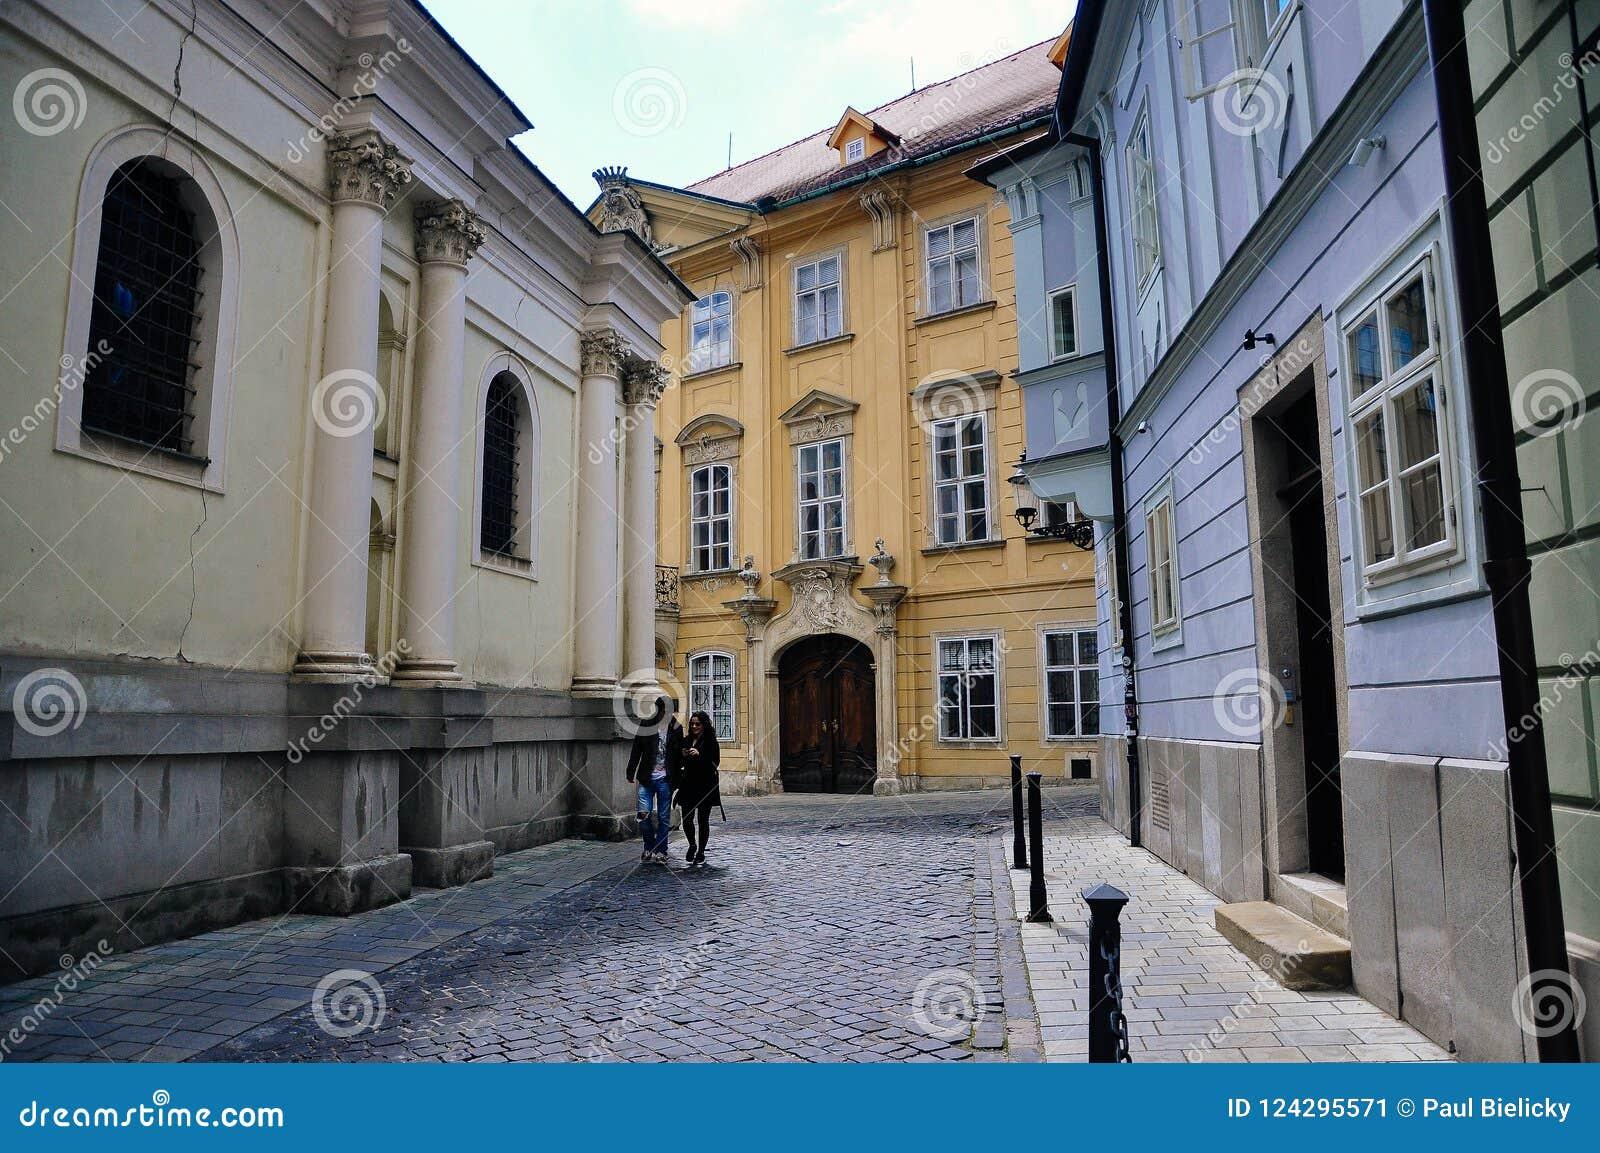 Locals walk in Old Bratislava, Slovakia.